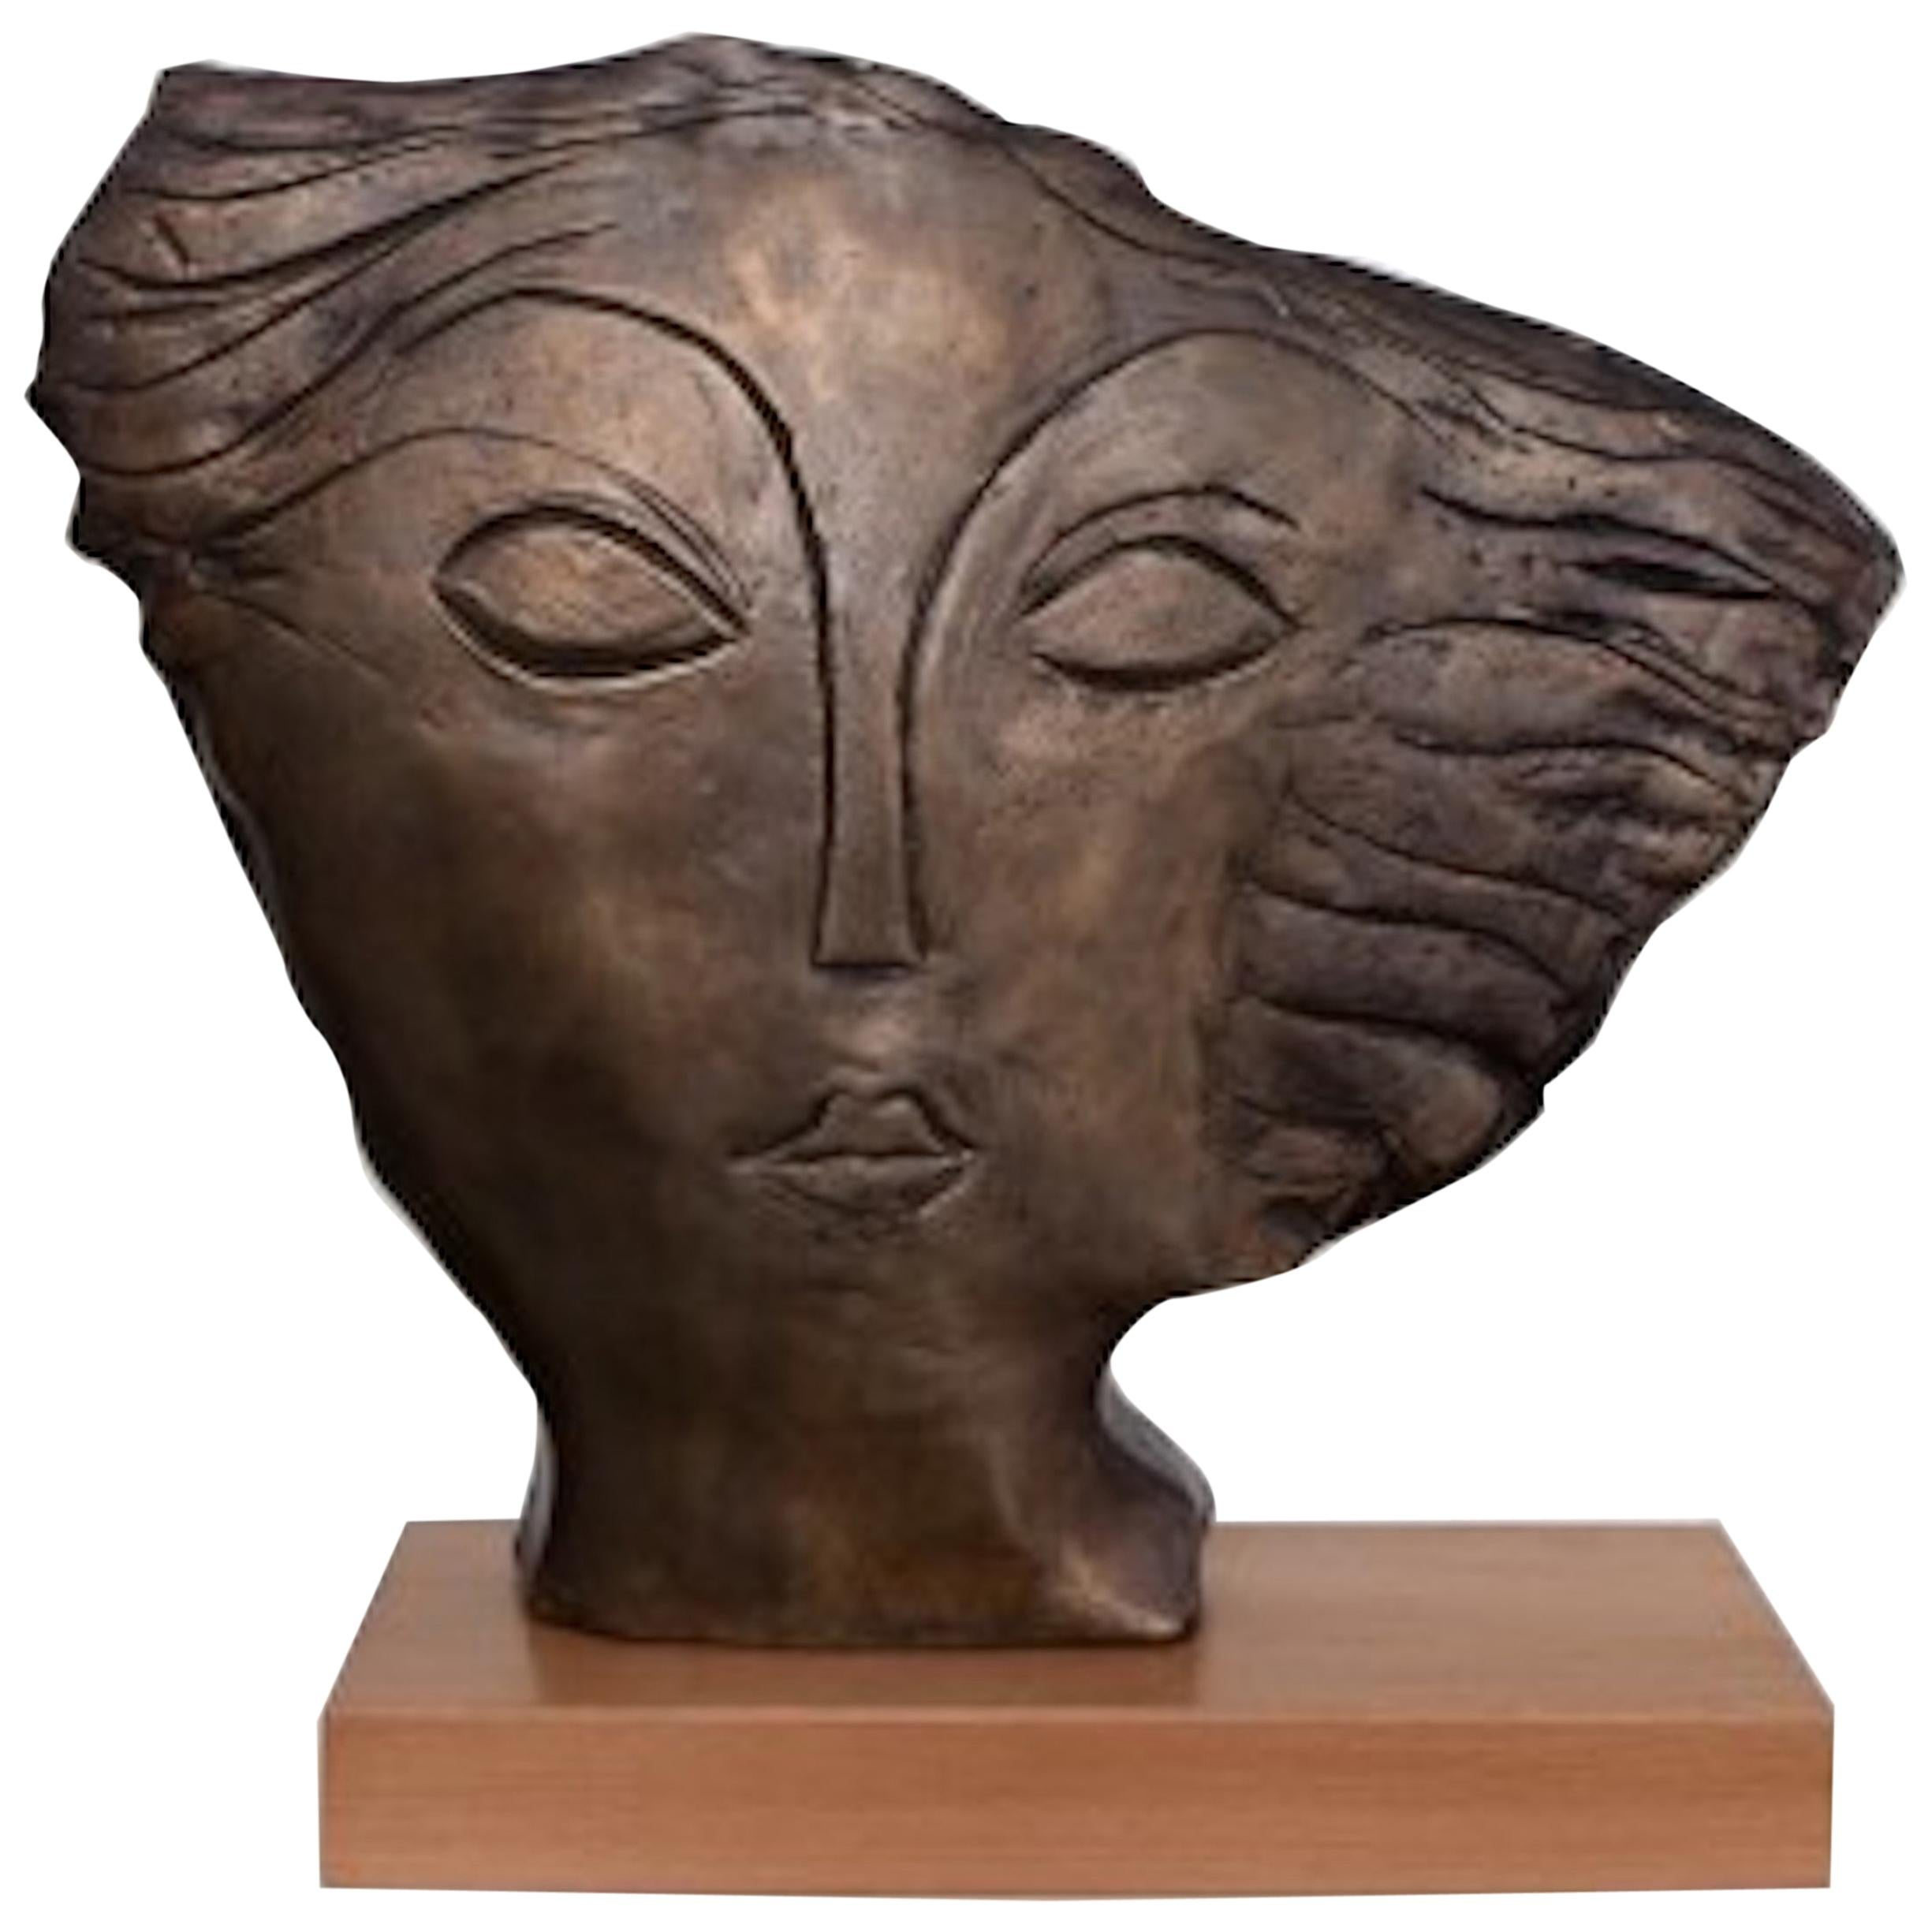 'Visage' One of a Kind Bronze Sculpture